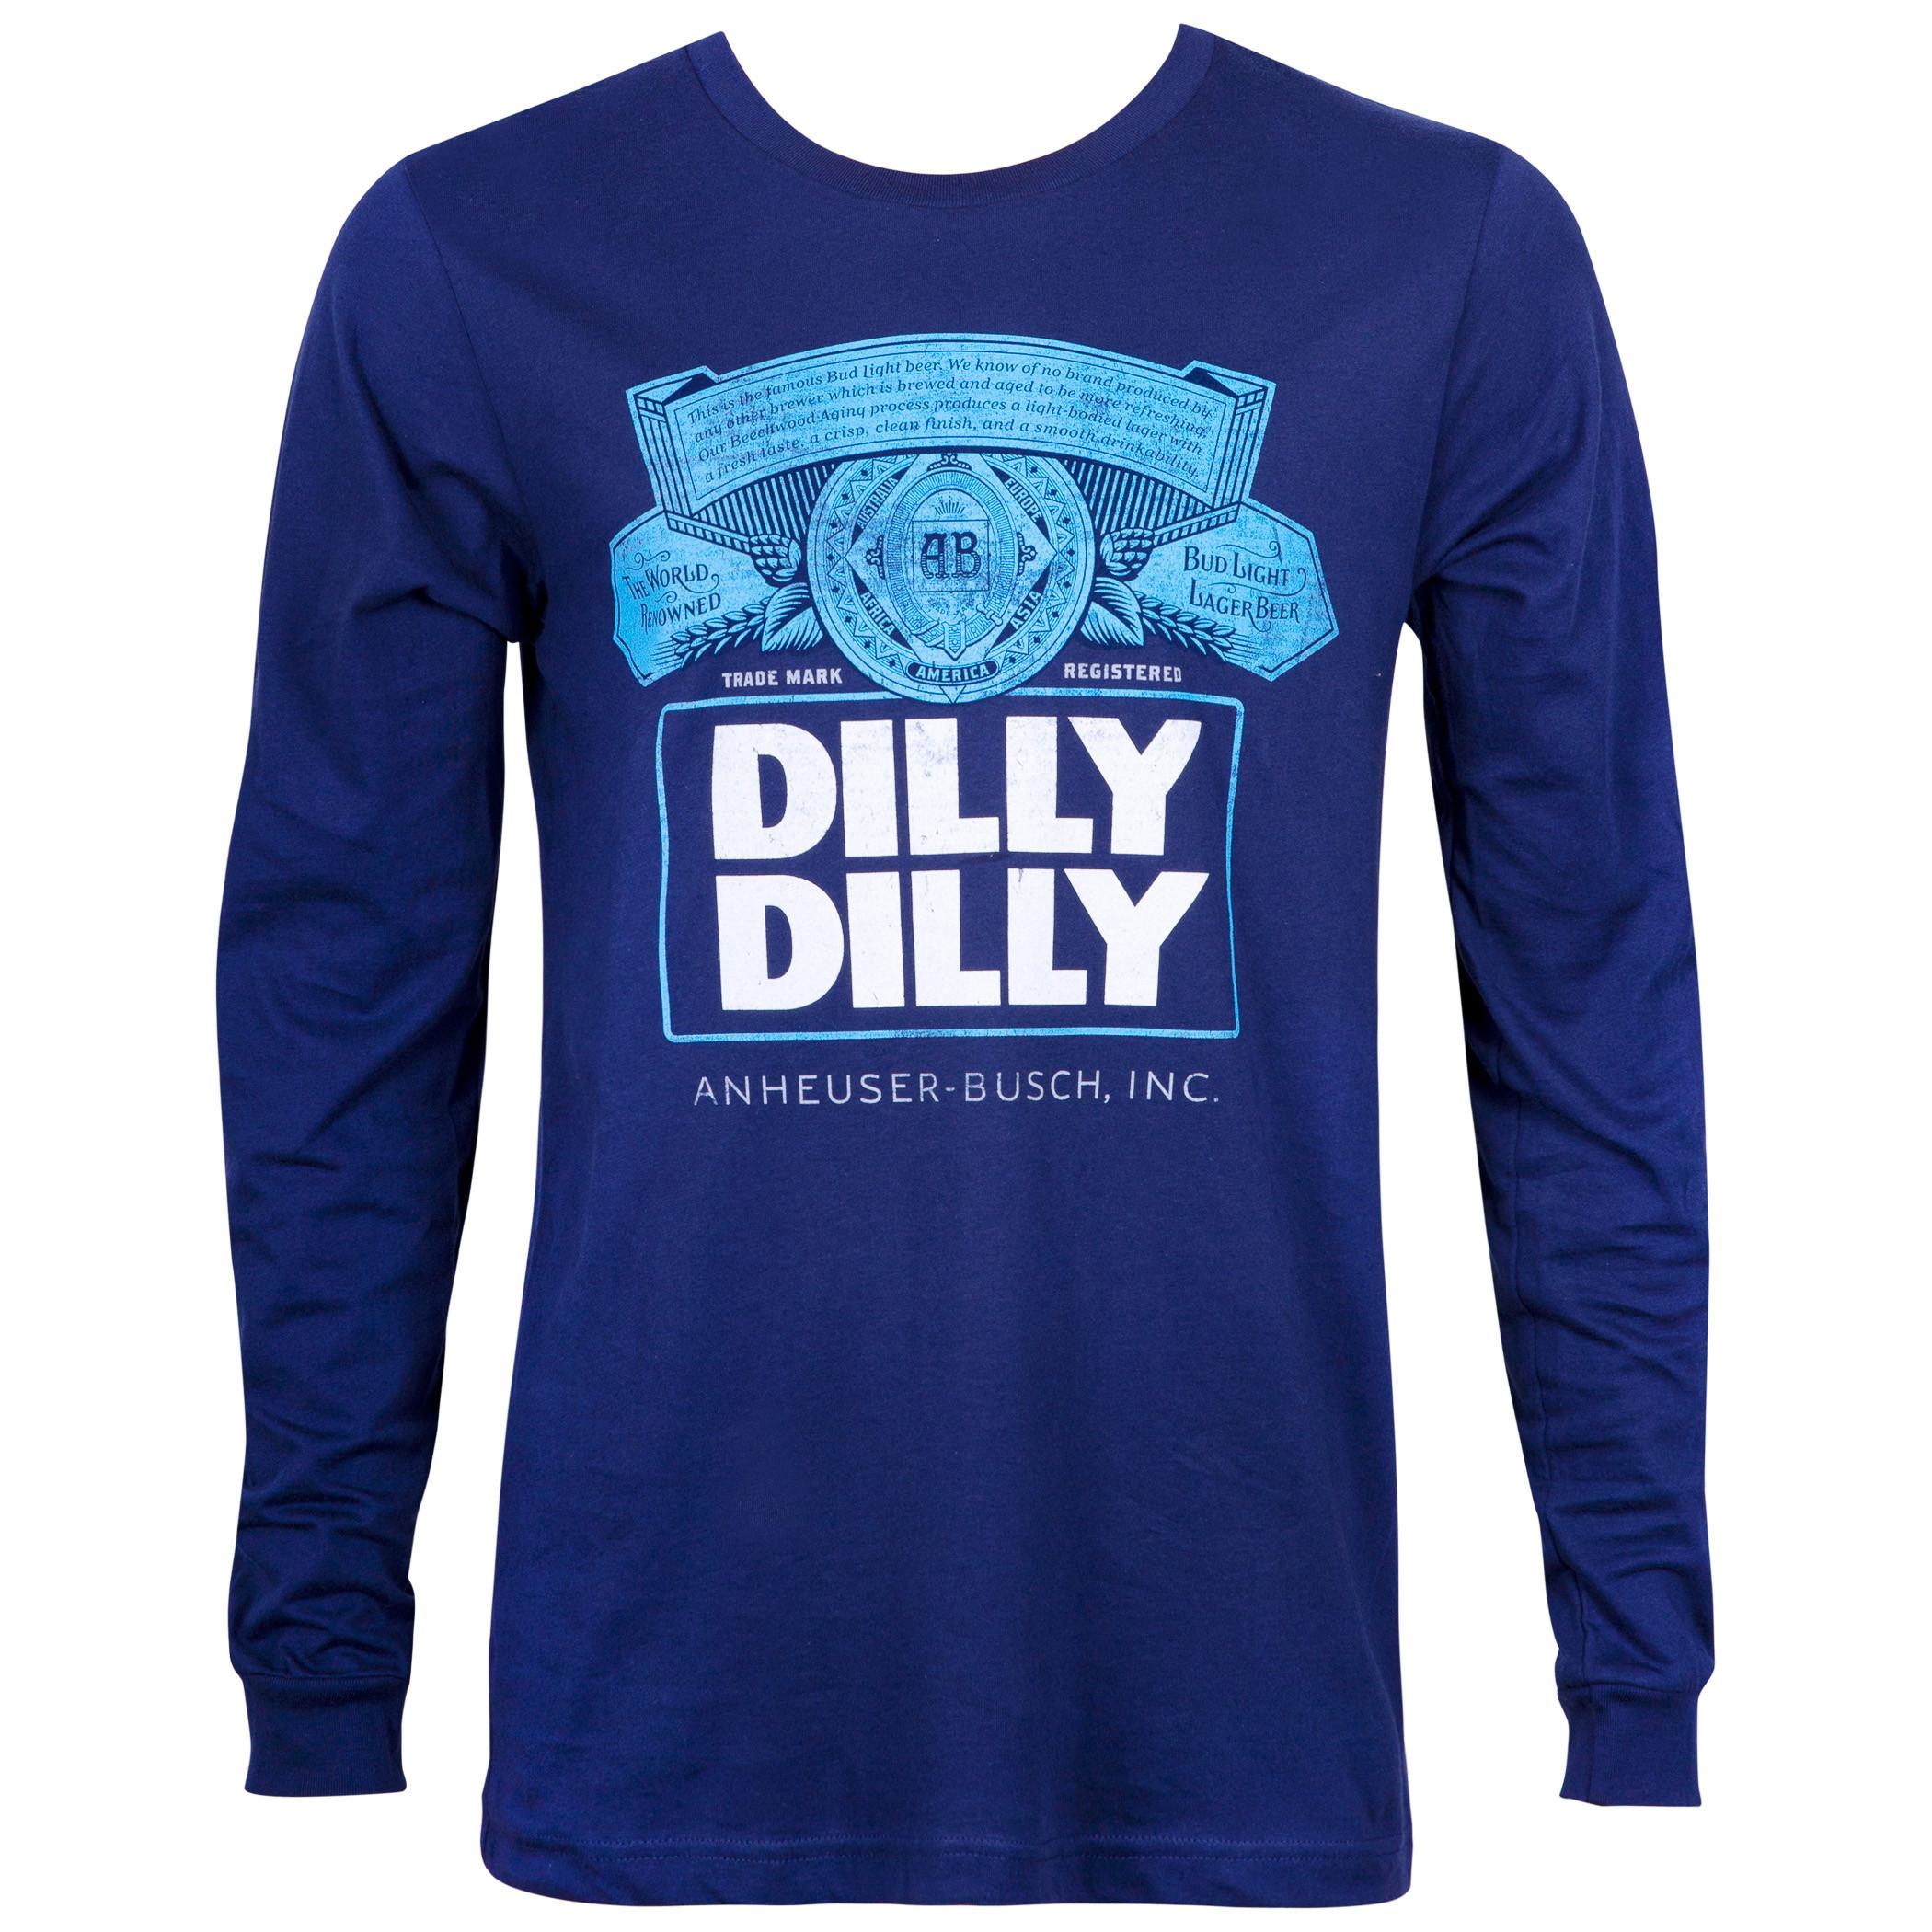 Bud Light Dilly Dilly Long Sleeve Navy Blue Shirt